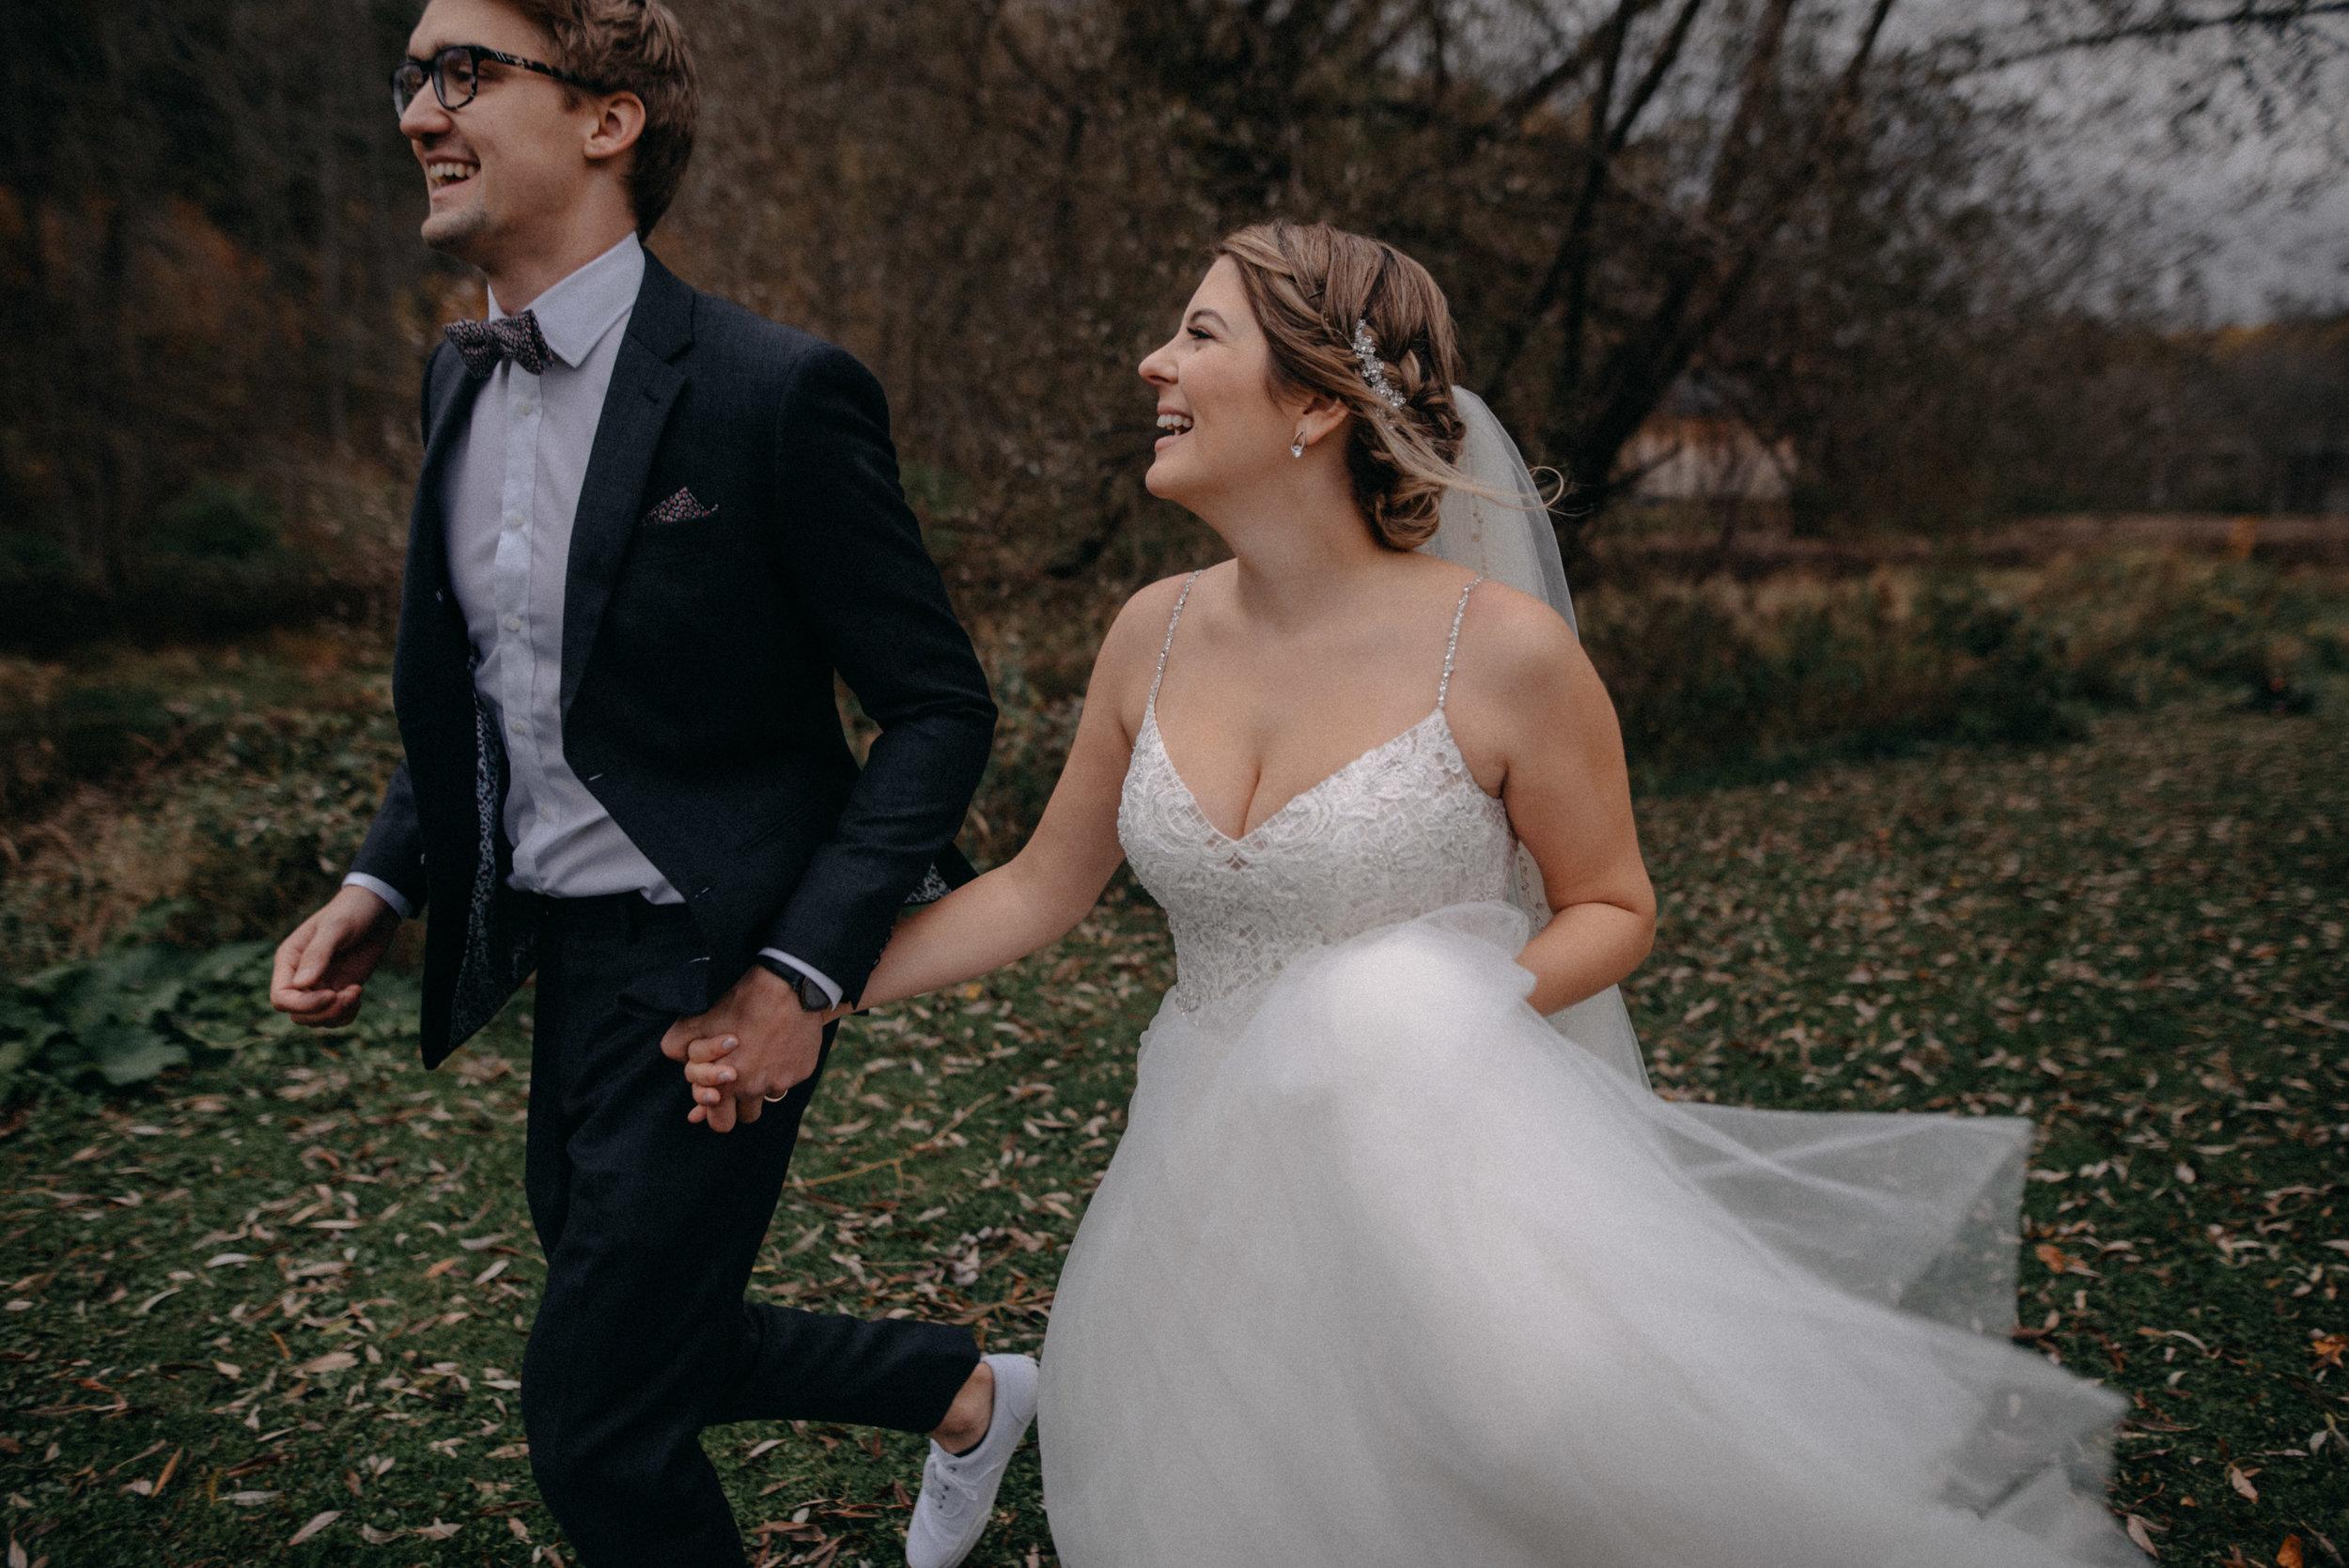 photographe_gatineau_mariage_ottawa_photographer_wedding_natasha_liard_photo_documentary_candid_lifestyle_wakefield_mill_red_bridge (43).jpg